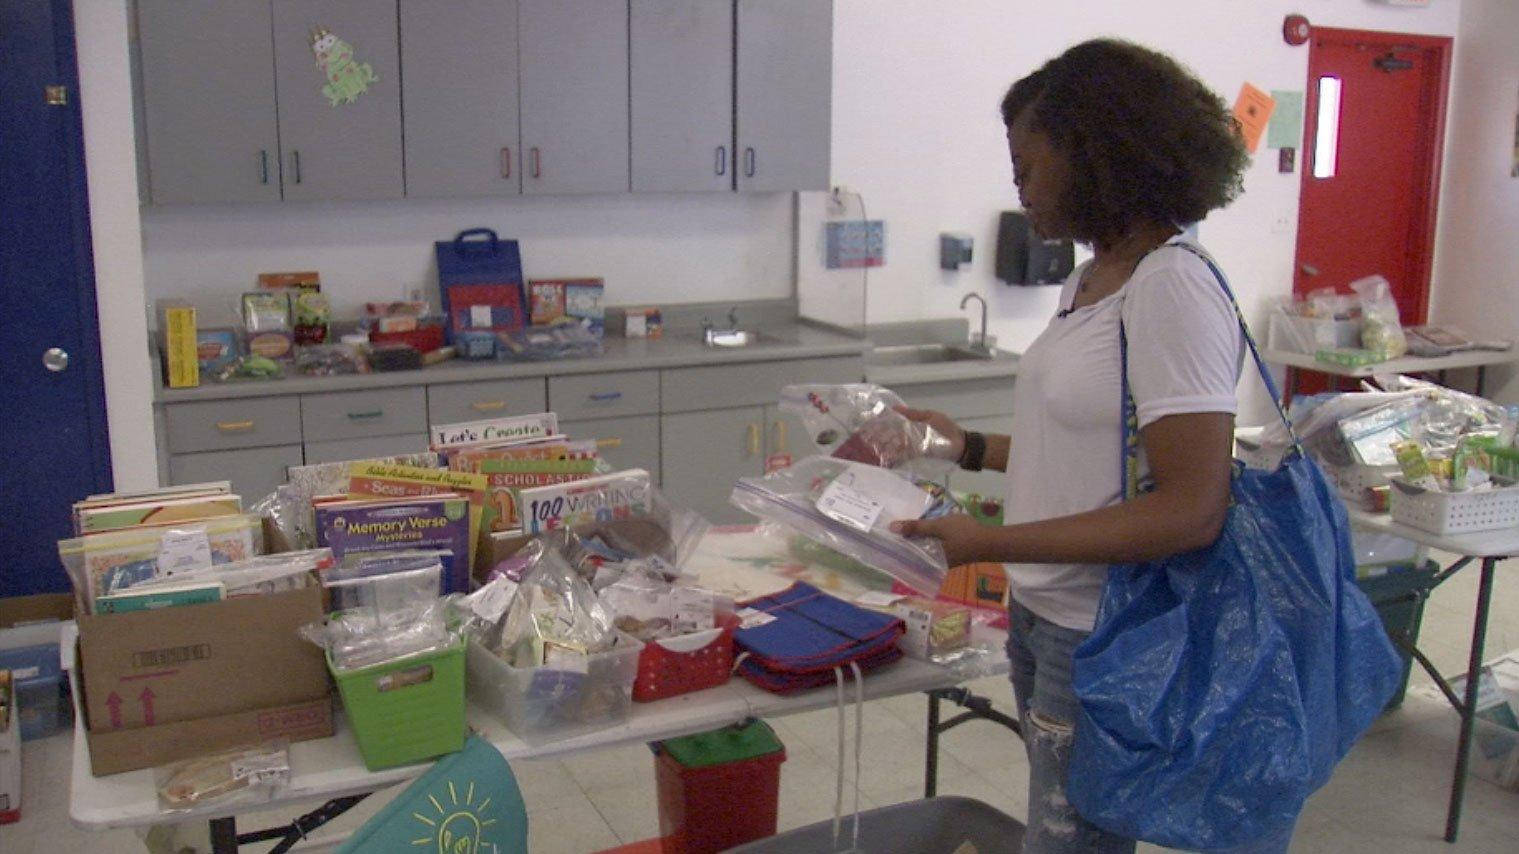 Ebonee Coe shops at Teacher2Teacher.Vegas on Aug. 4, 2017. (Cyndi Lundeberg/FOX5)